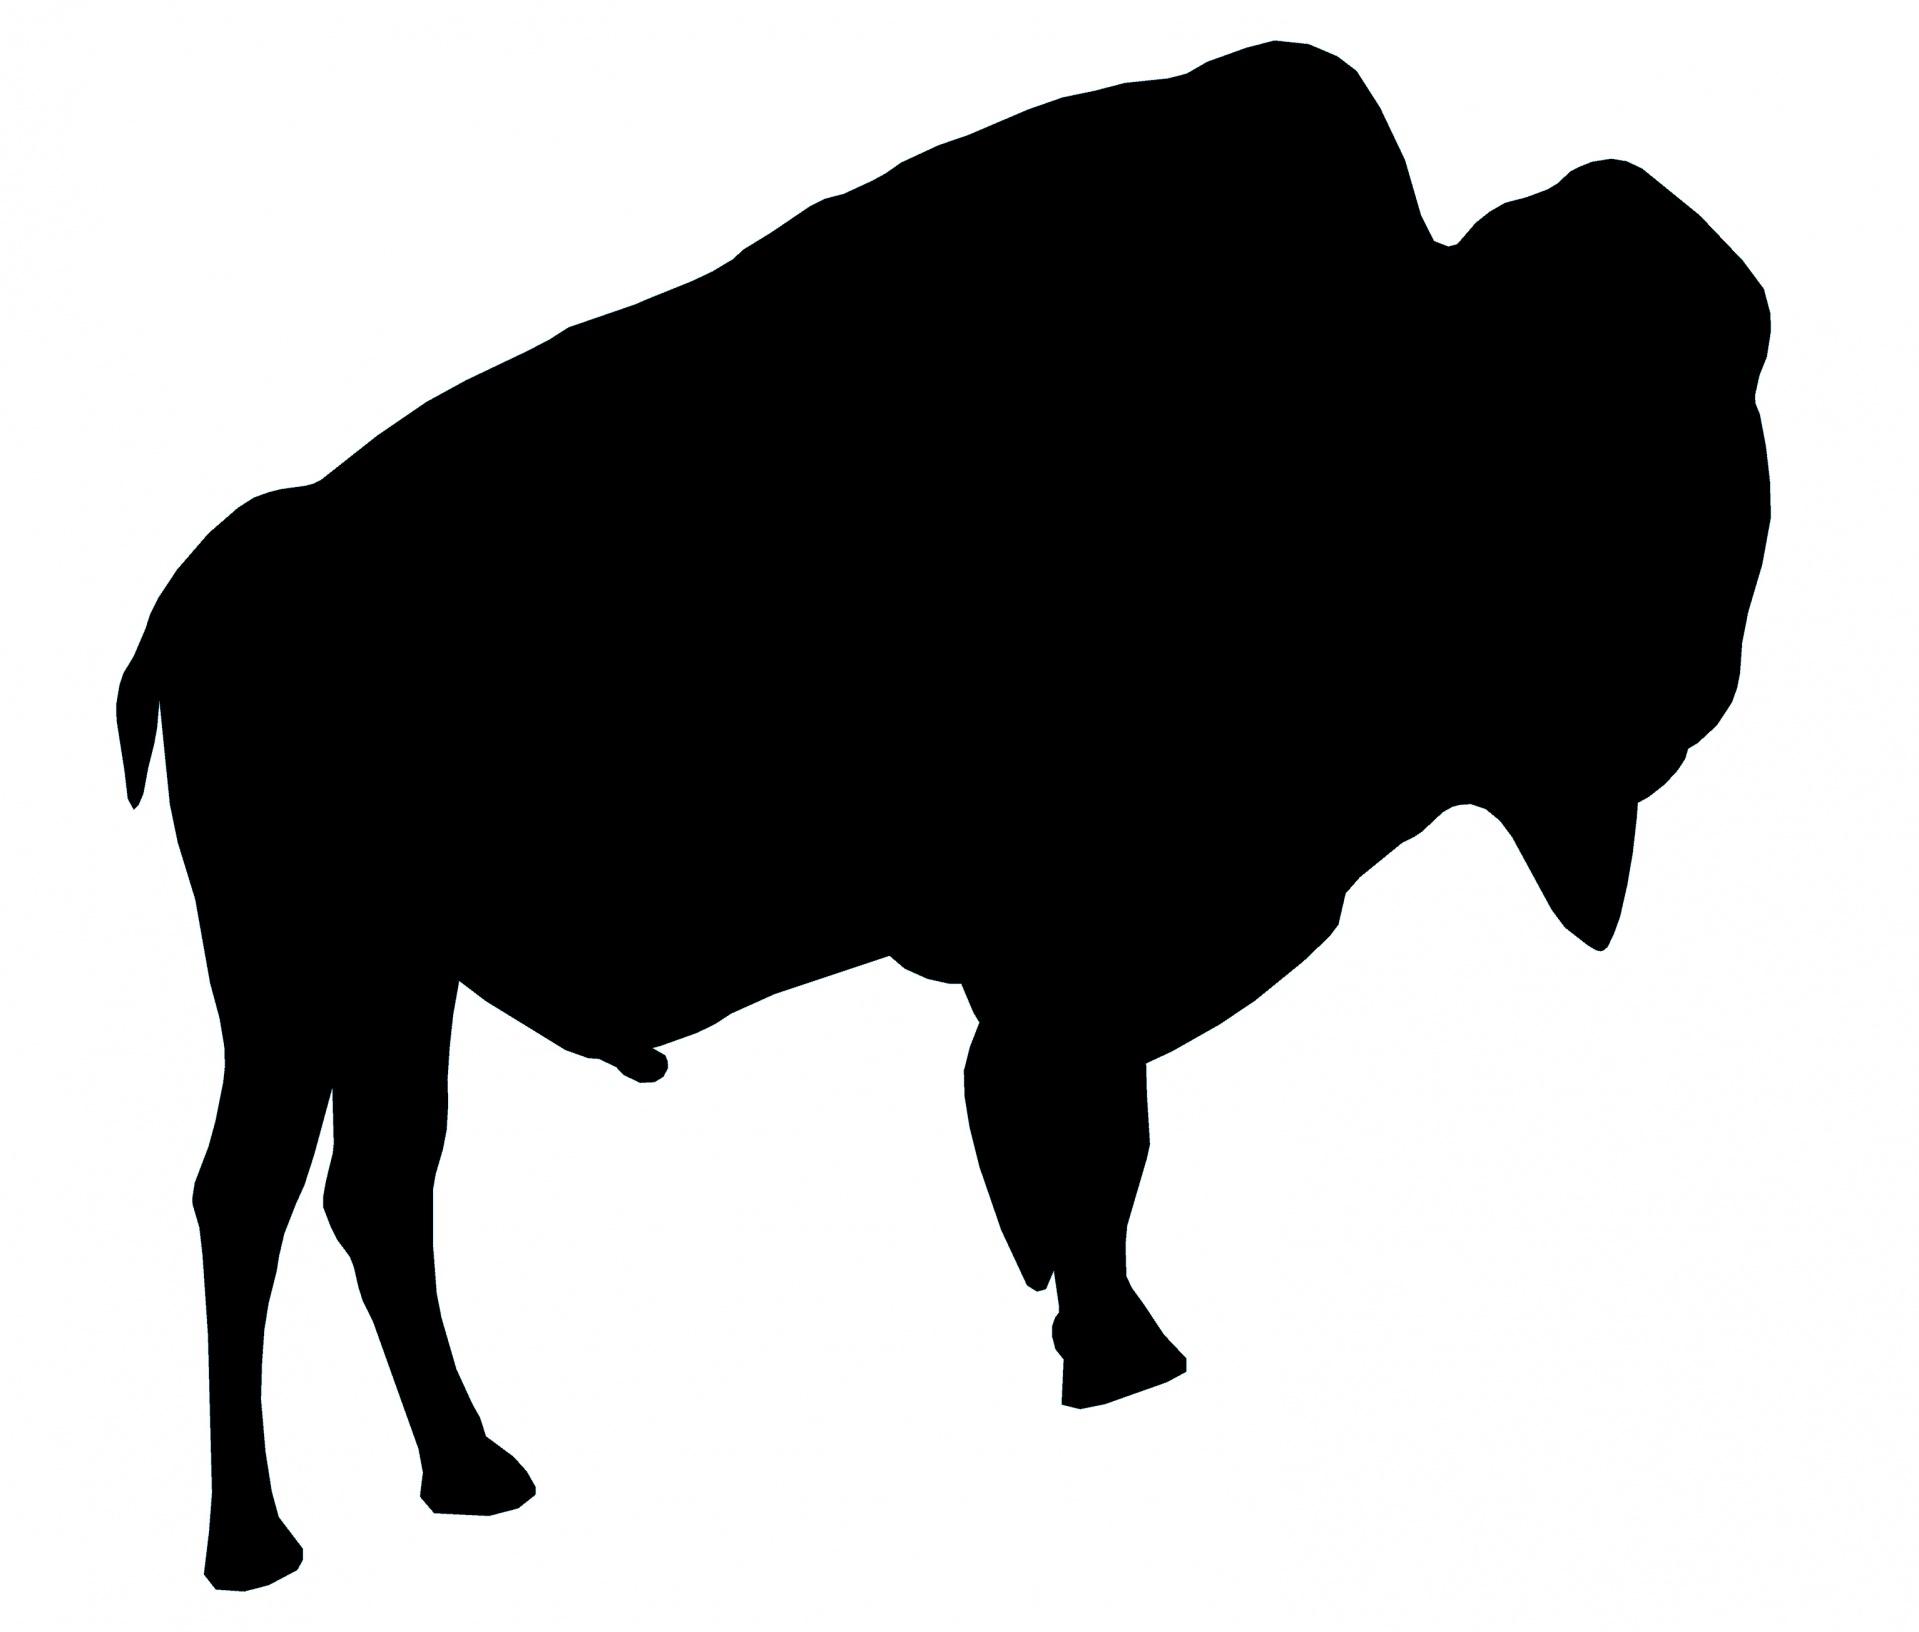 Black free stock photo. Bison clipart white background